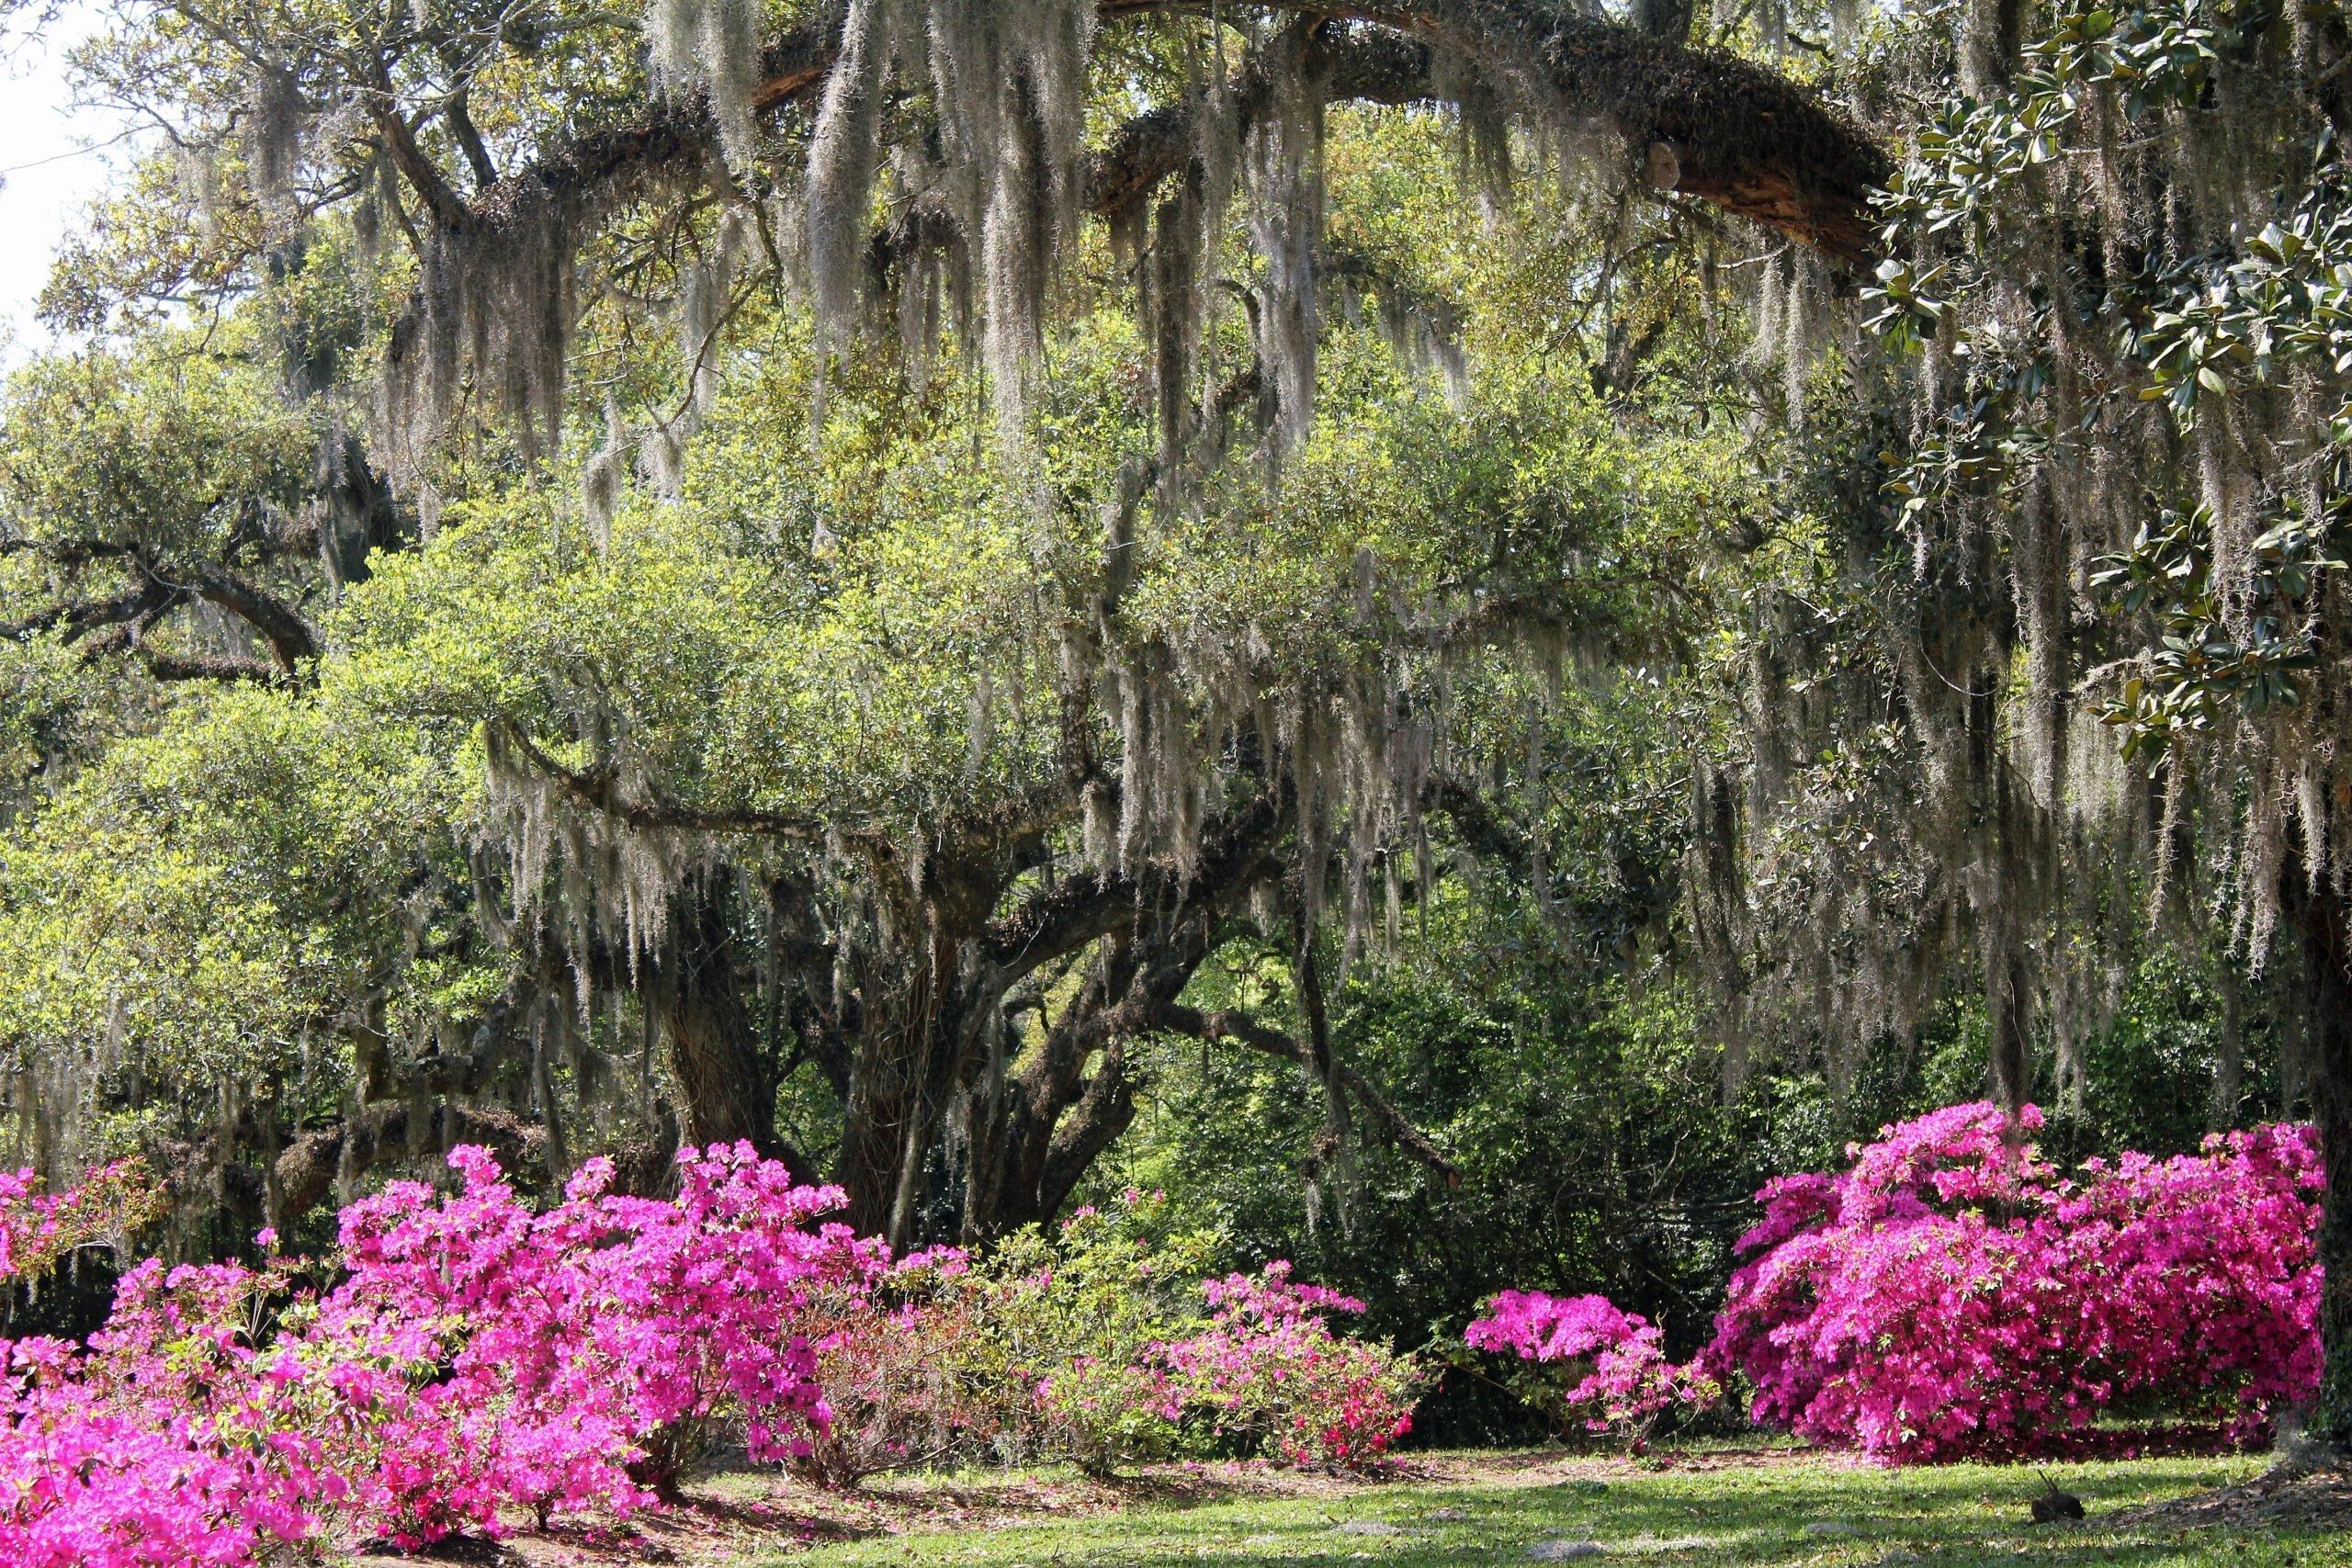 Azaleas at the peak of blossoming surrounded by huge oaks draped in spanish moss on a bright, sunshiny day. Gardens at Avery Island, New Iberia, Louisiana.